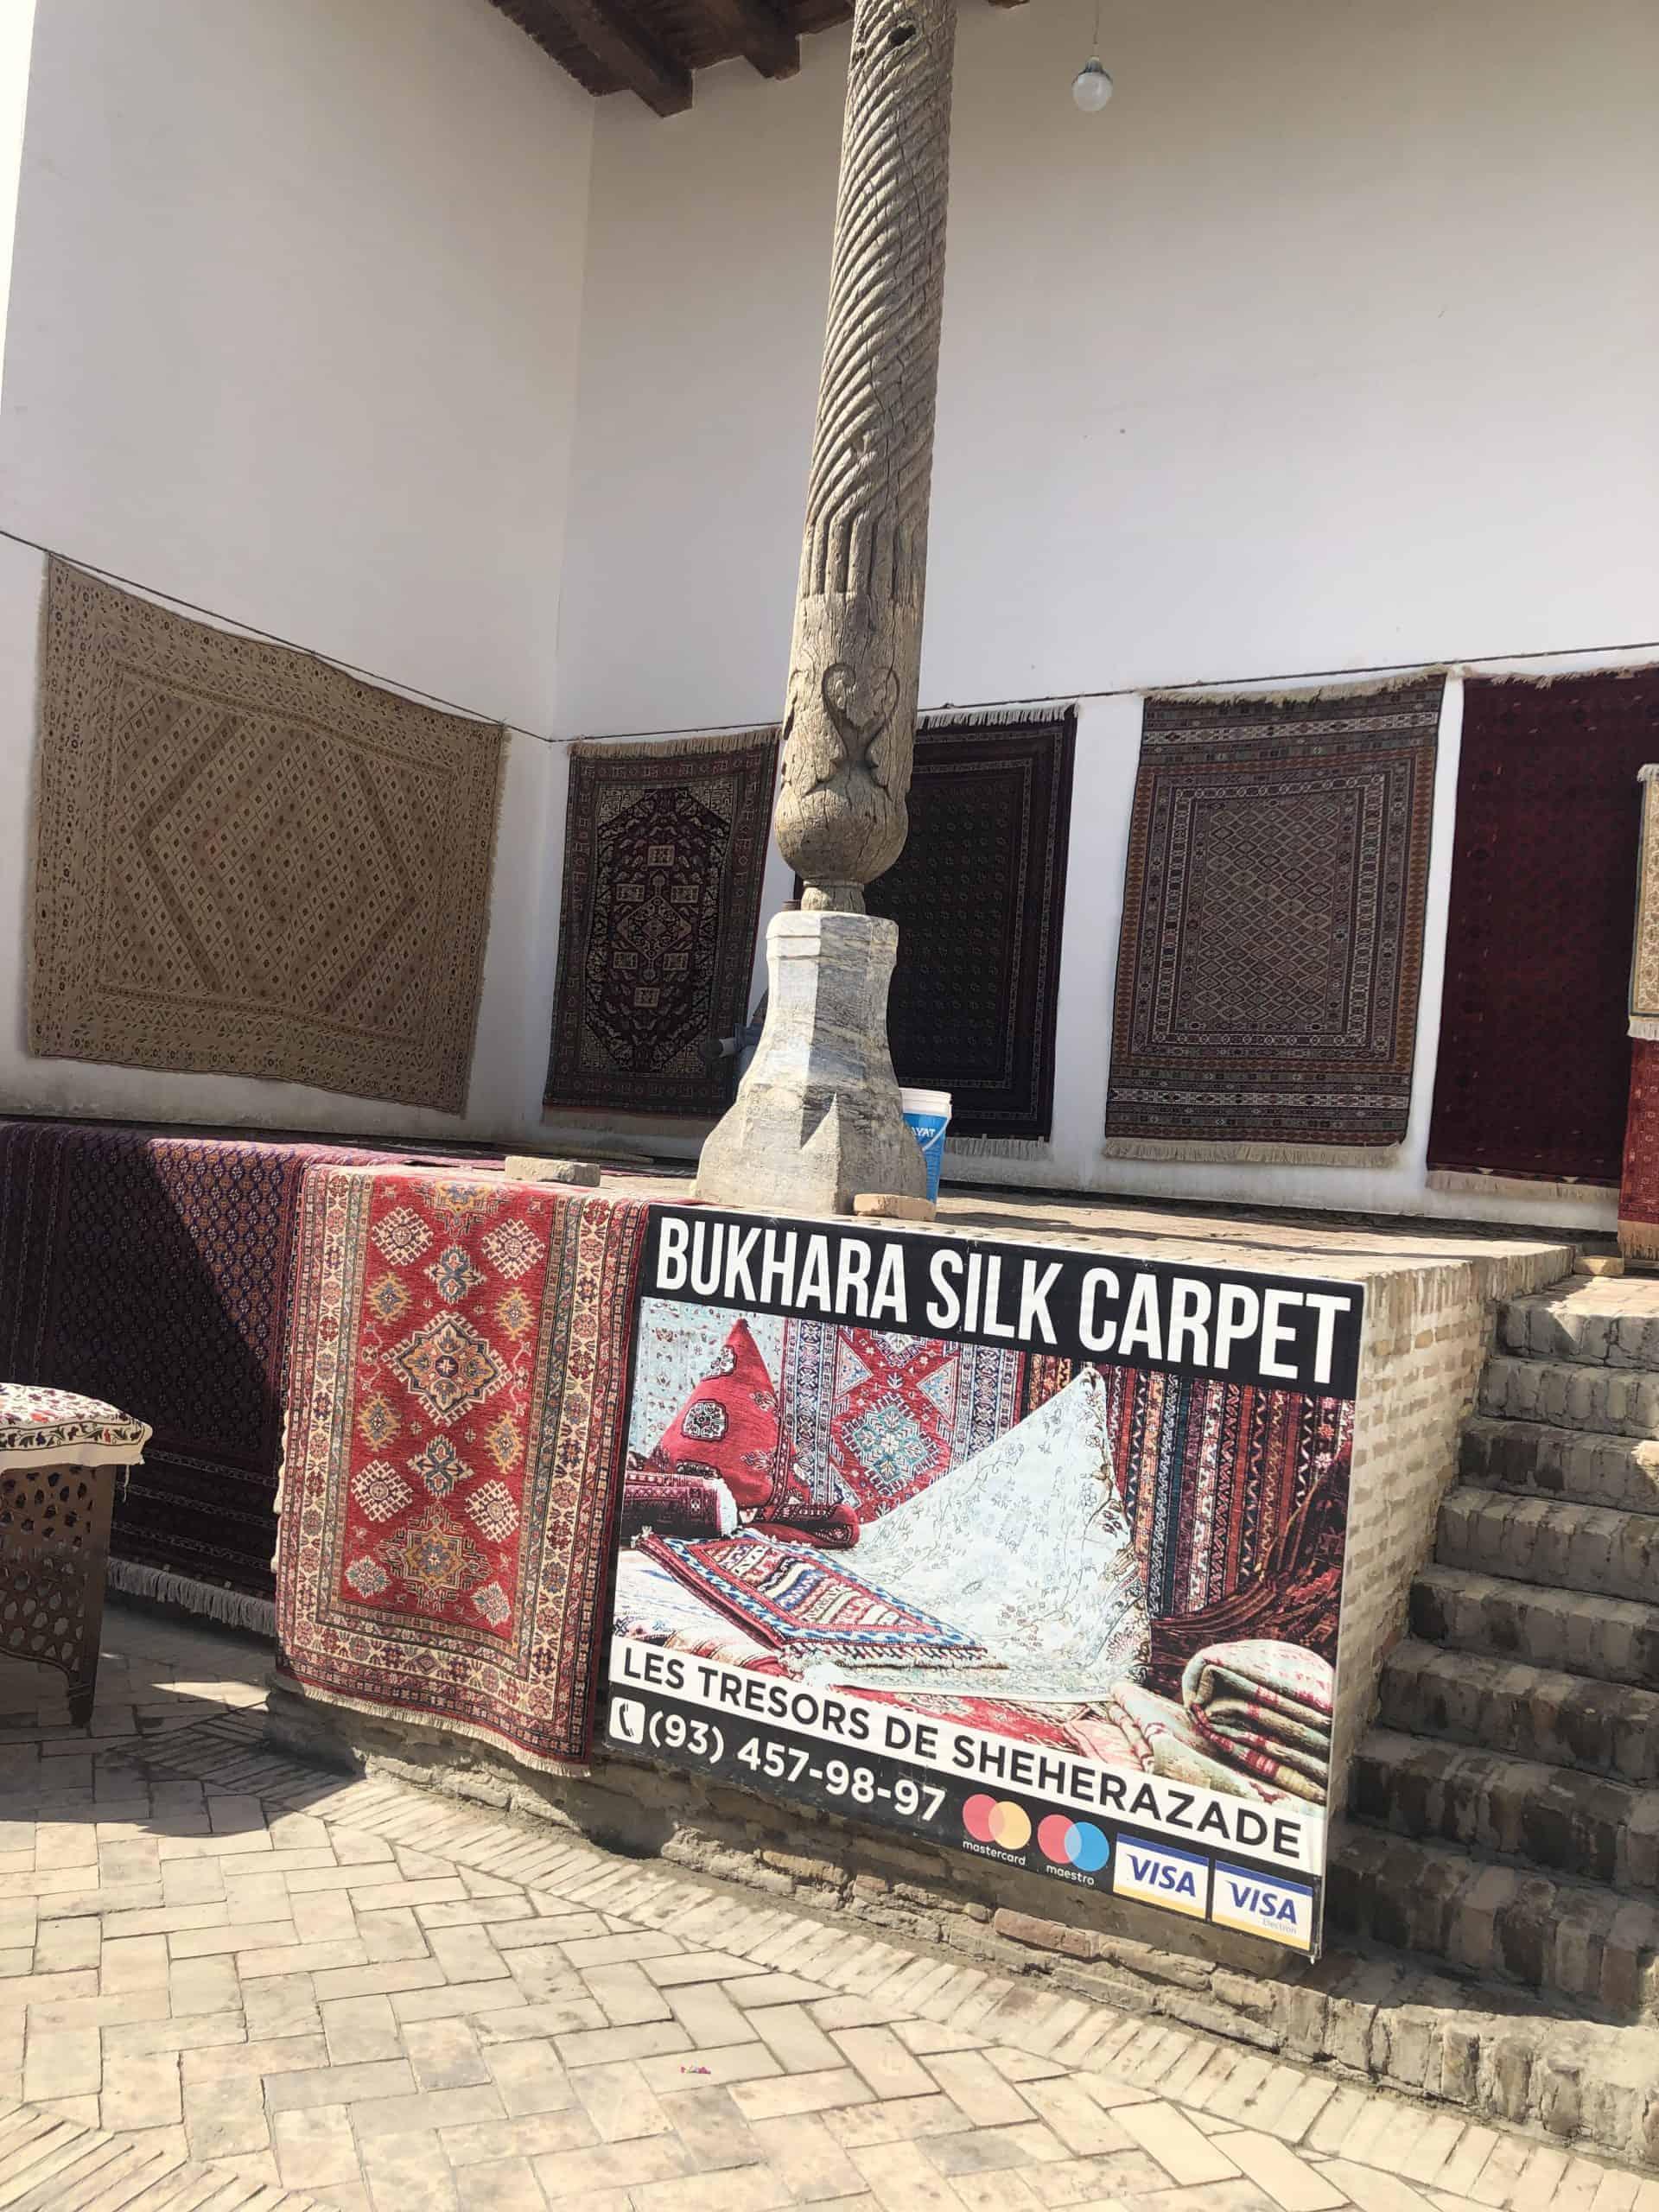 Bukhara souvenirs